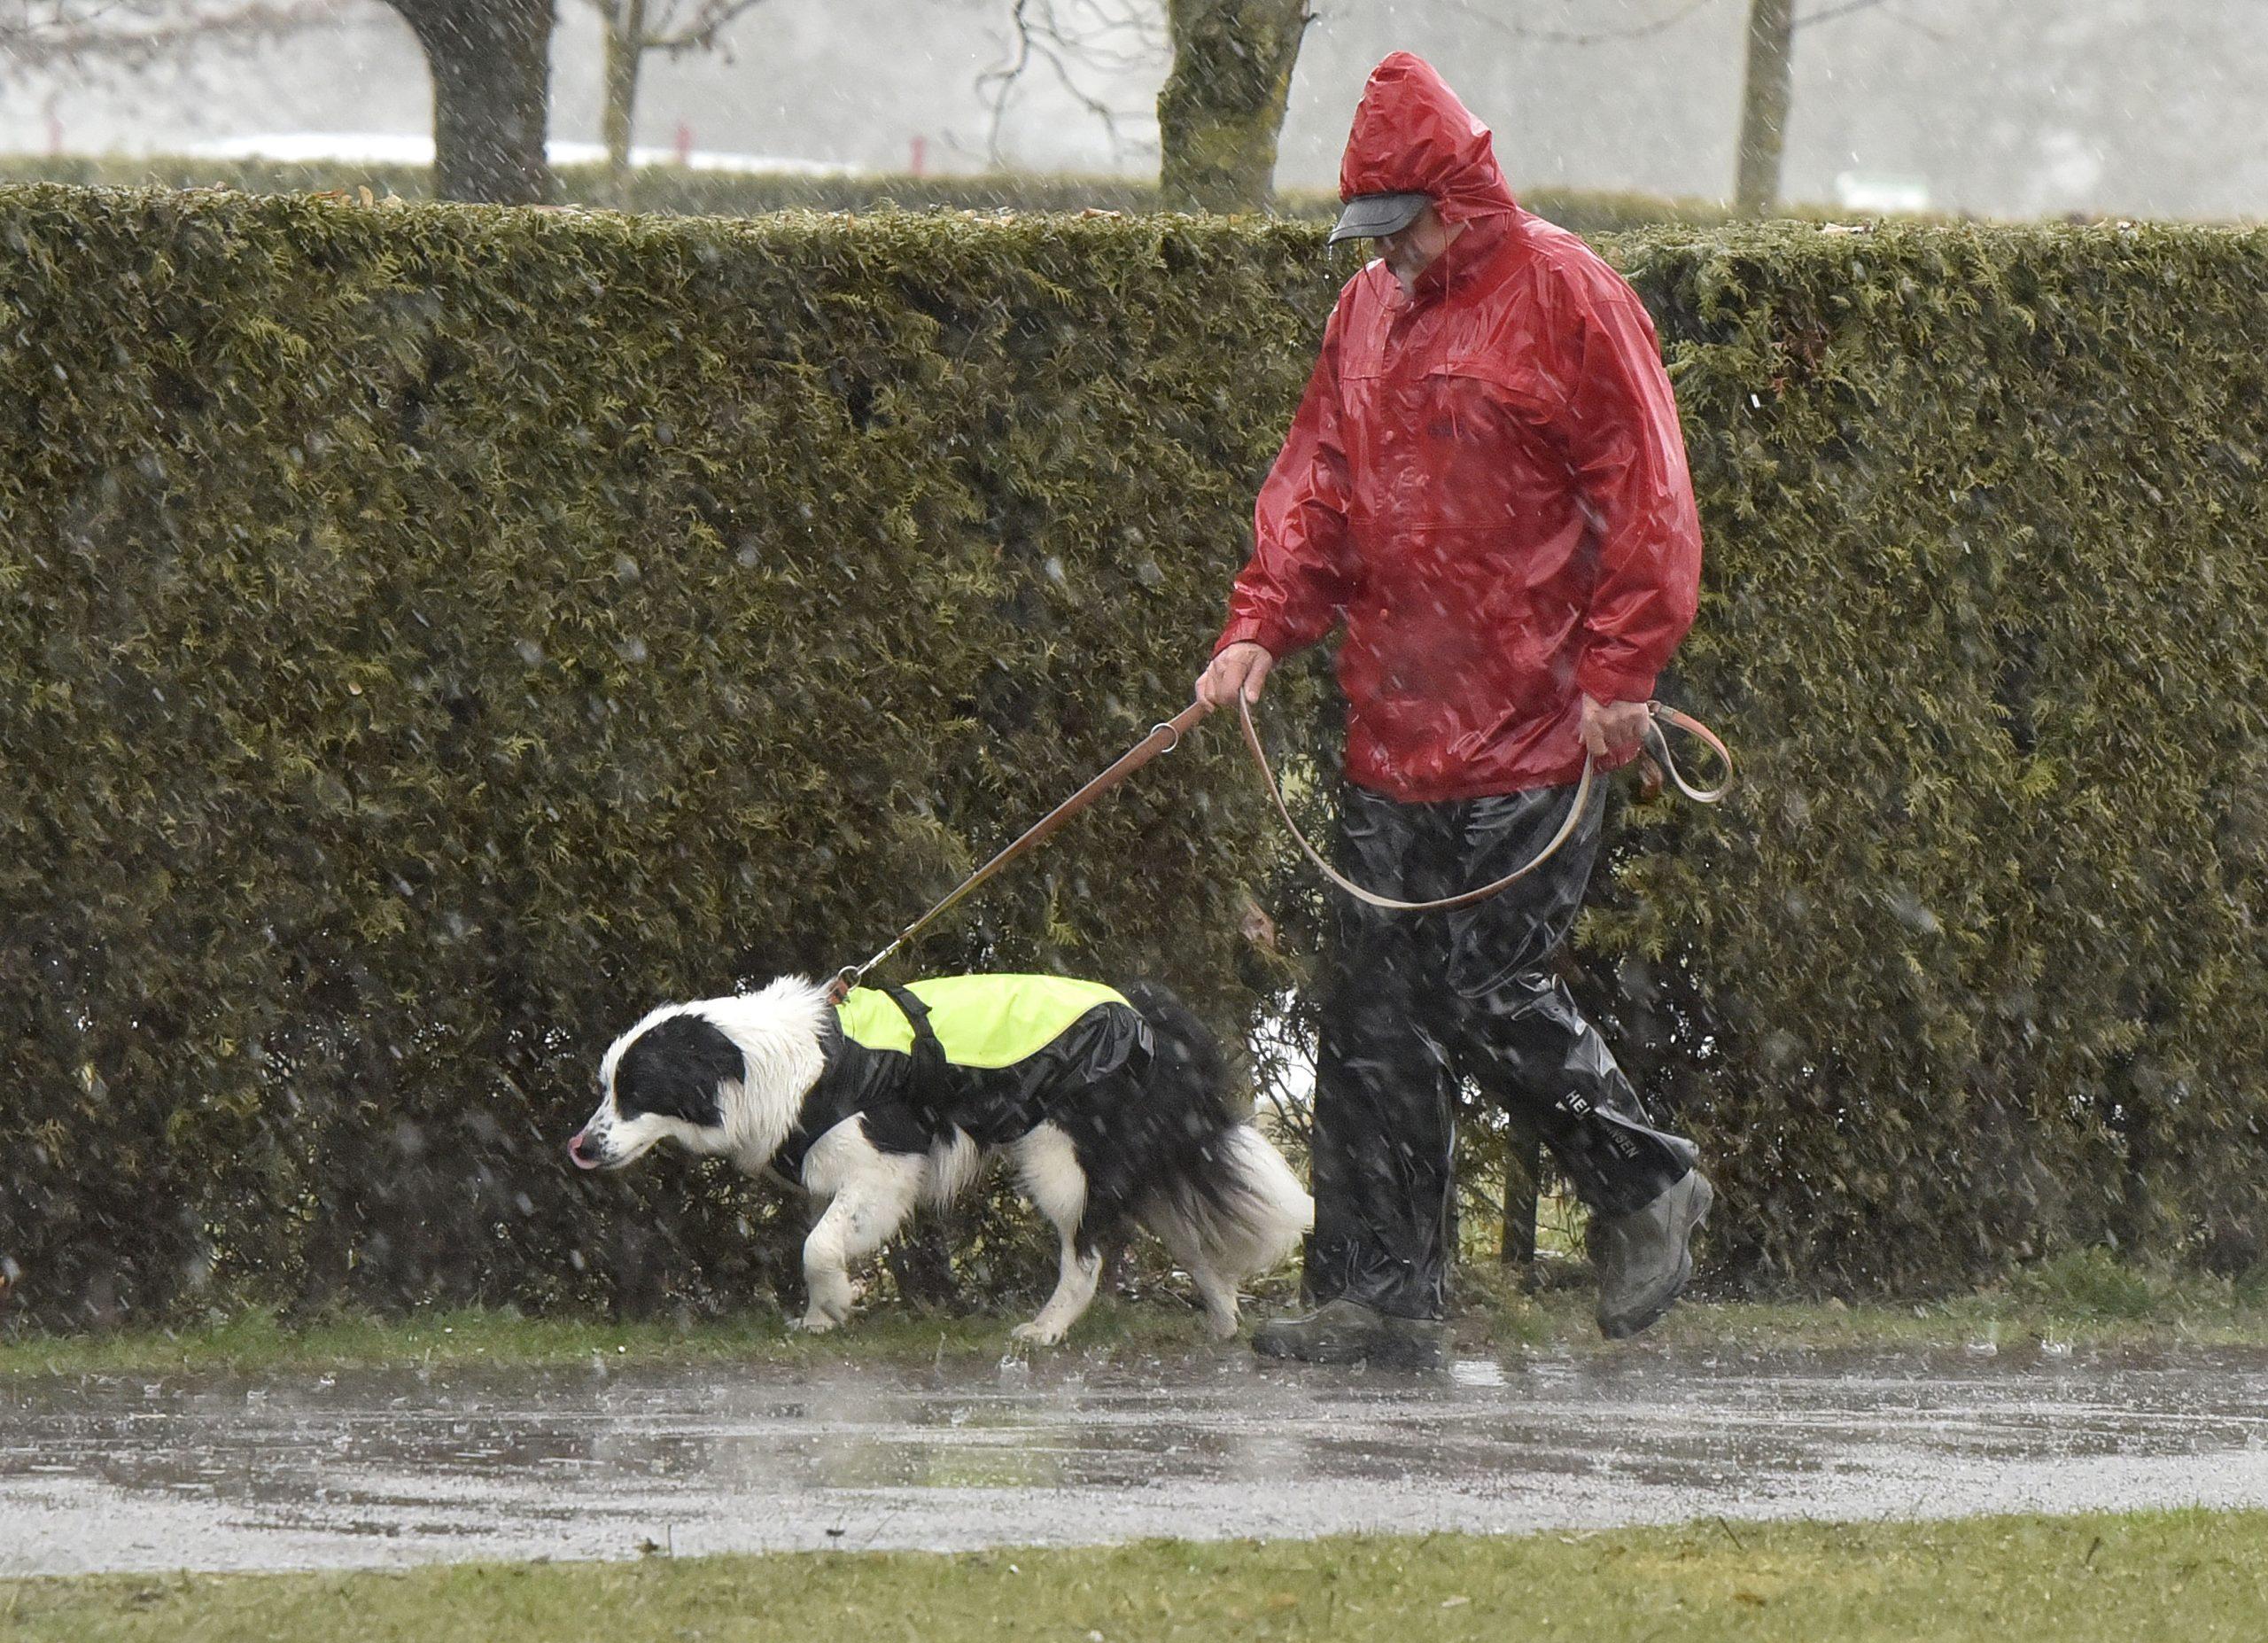 Sprehod s psom po dežju